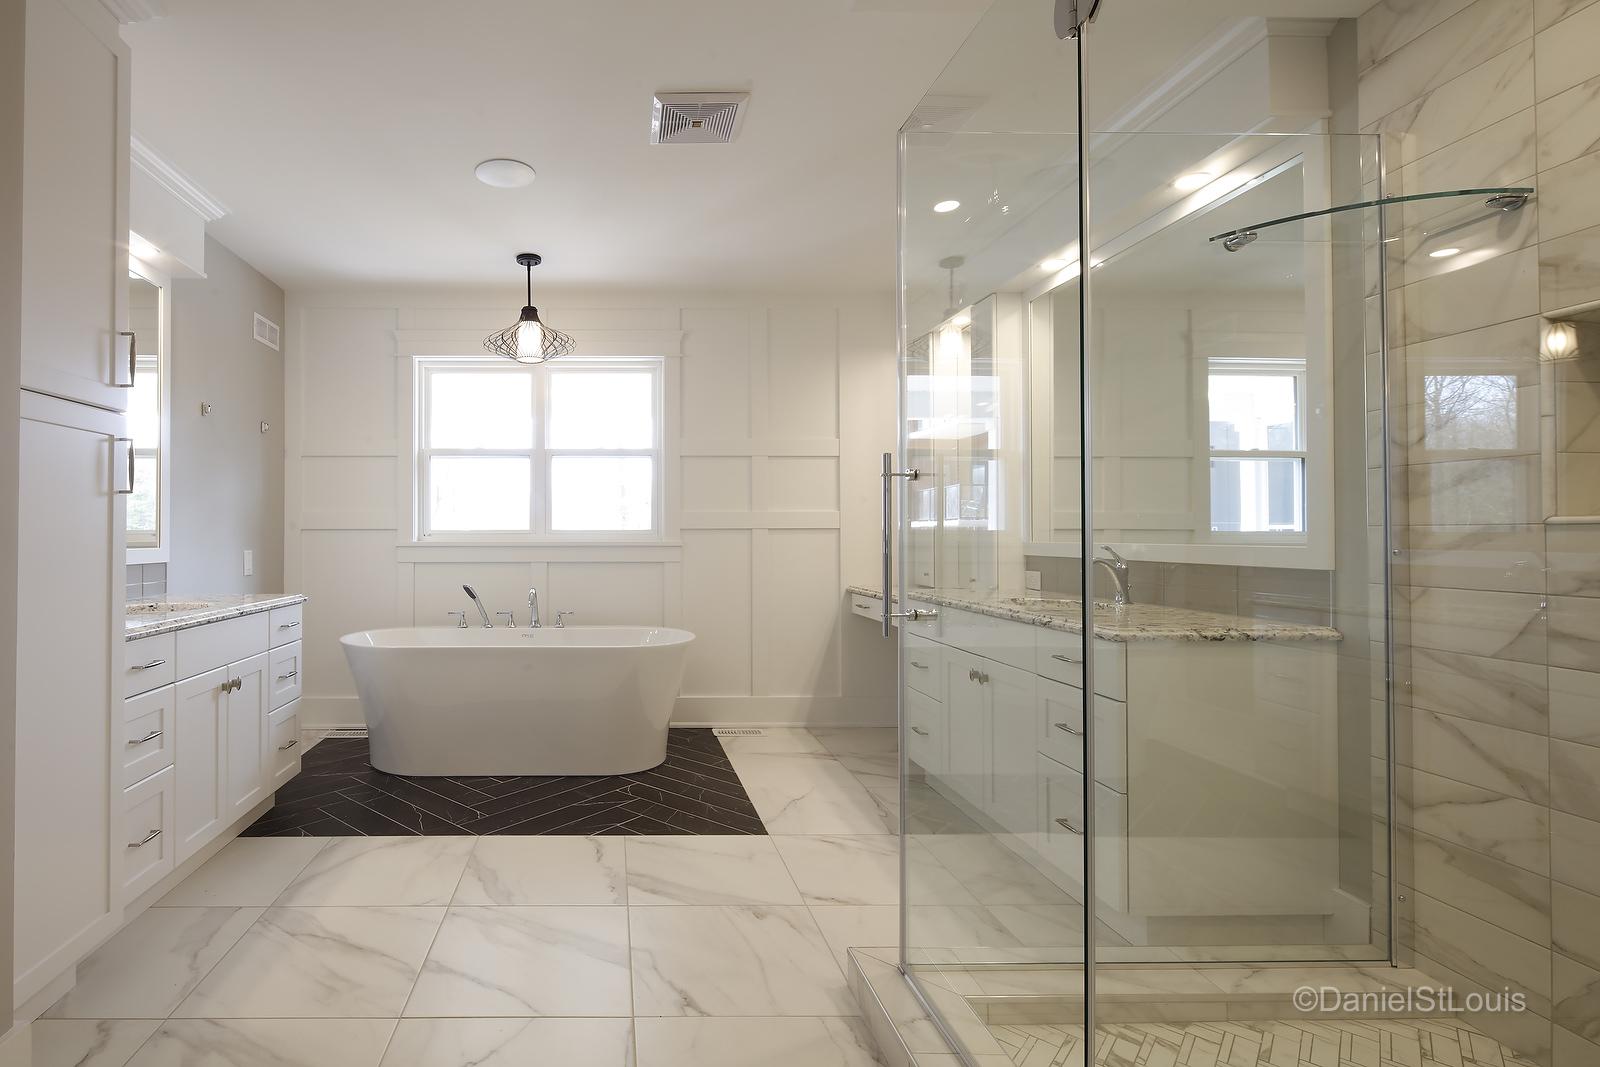 PRECISION CUSTOM HOMES - BATHROOM